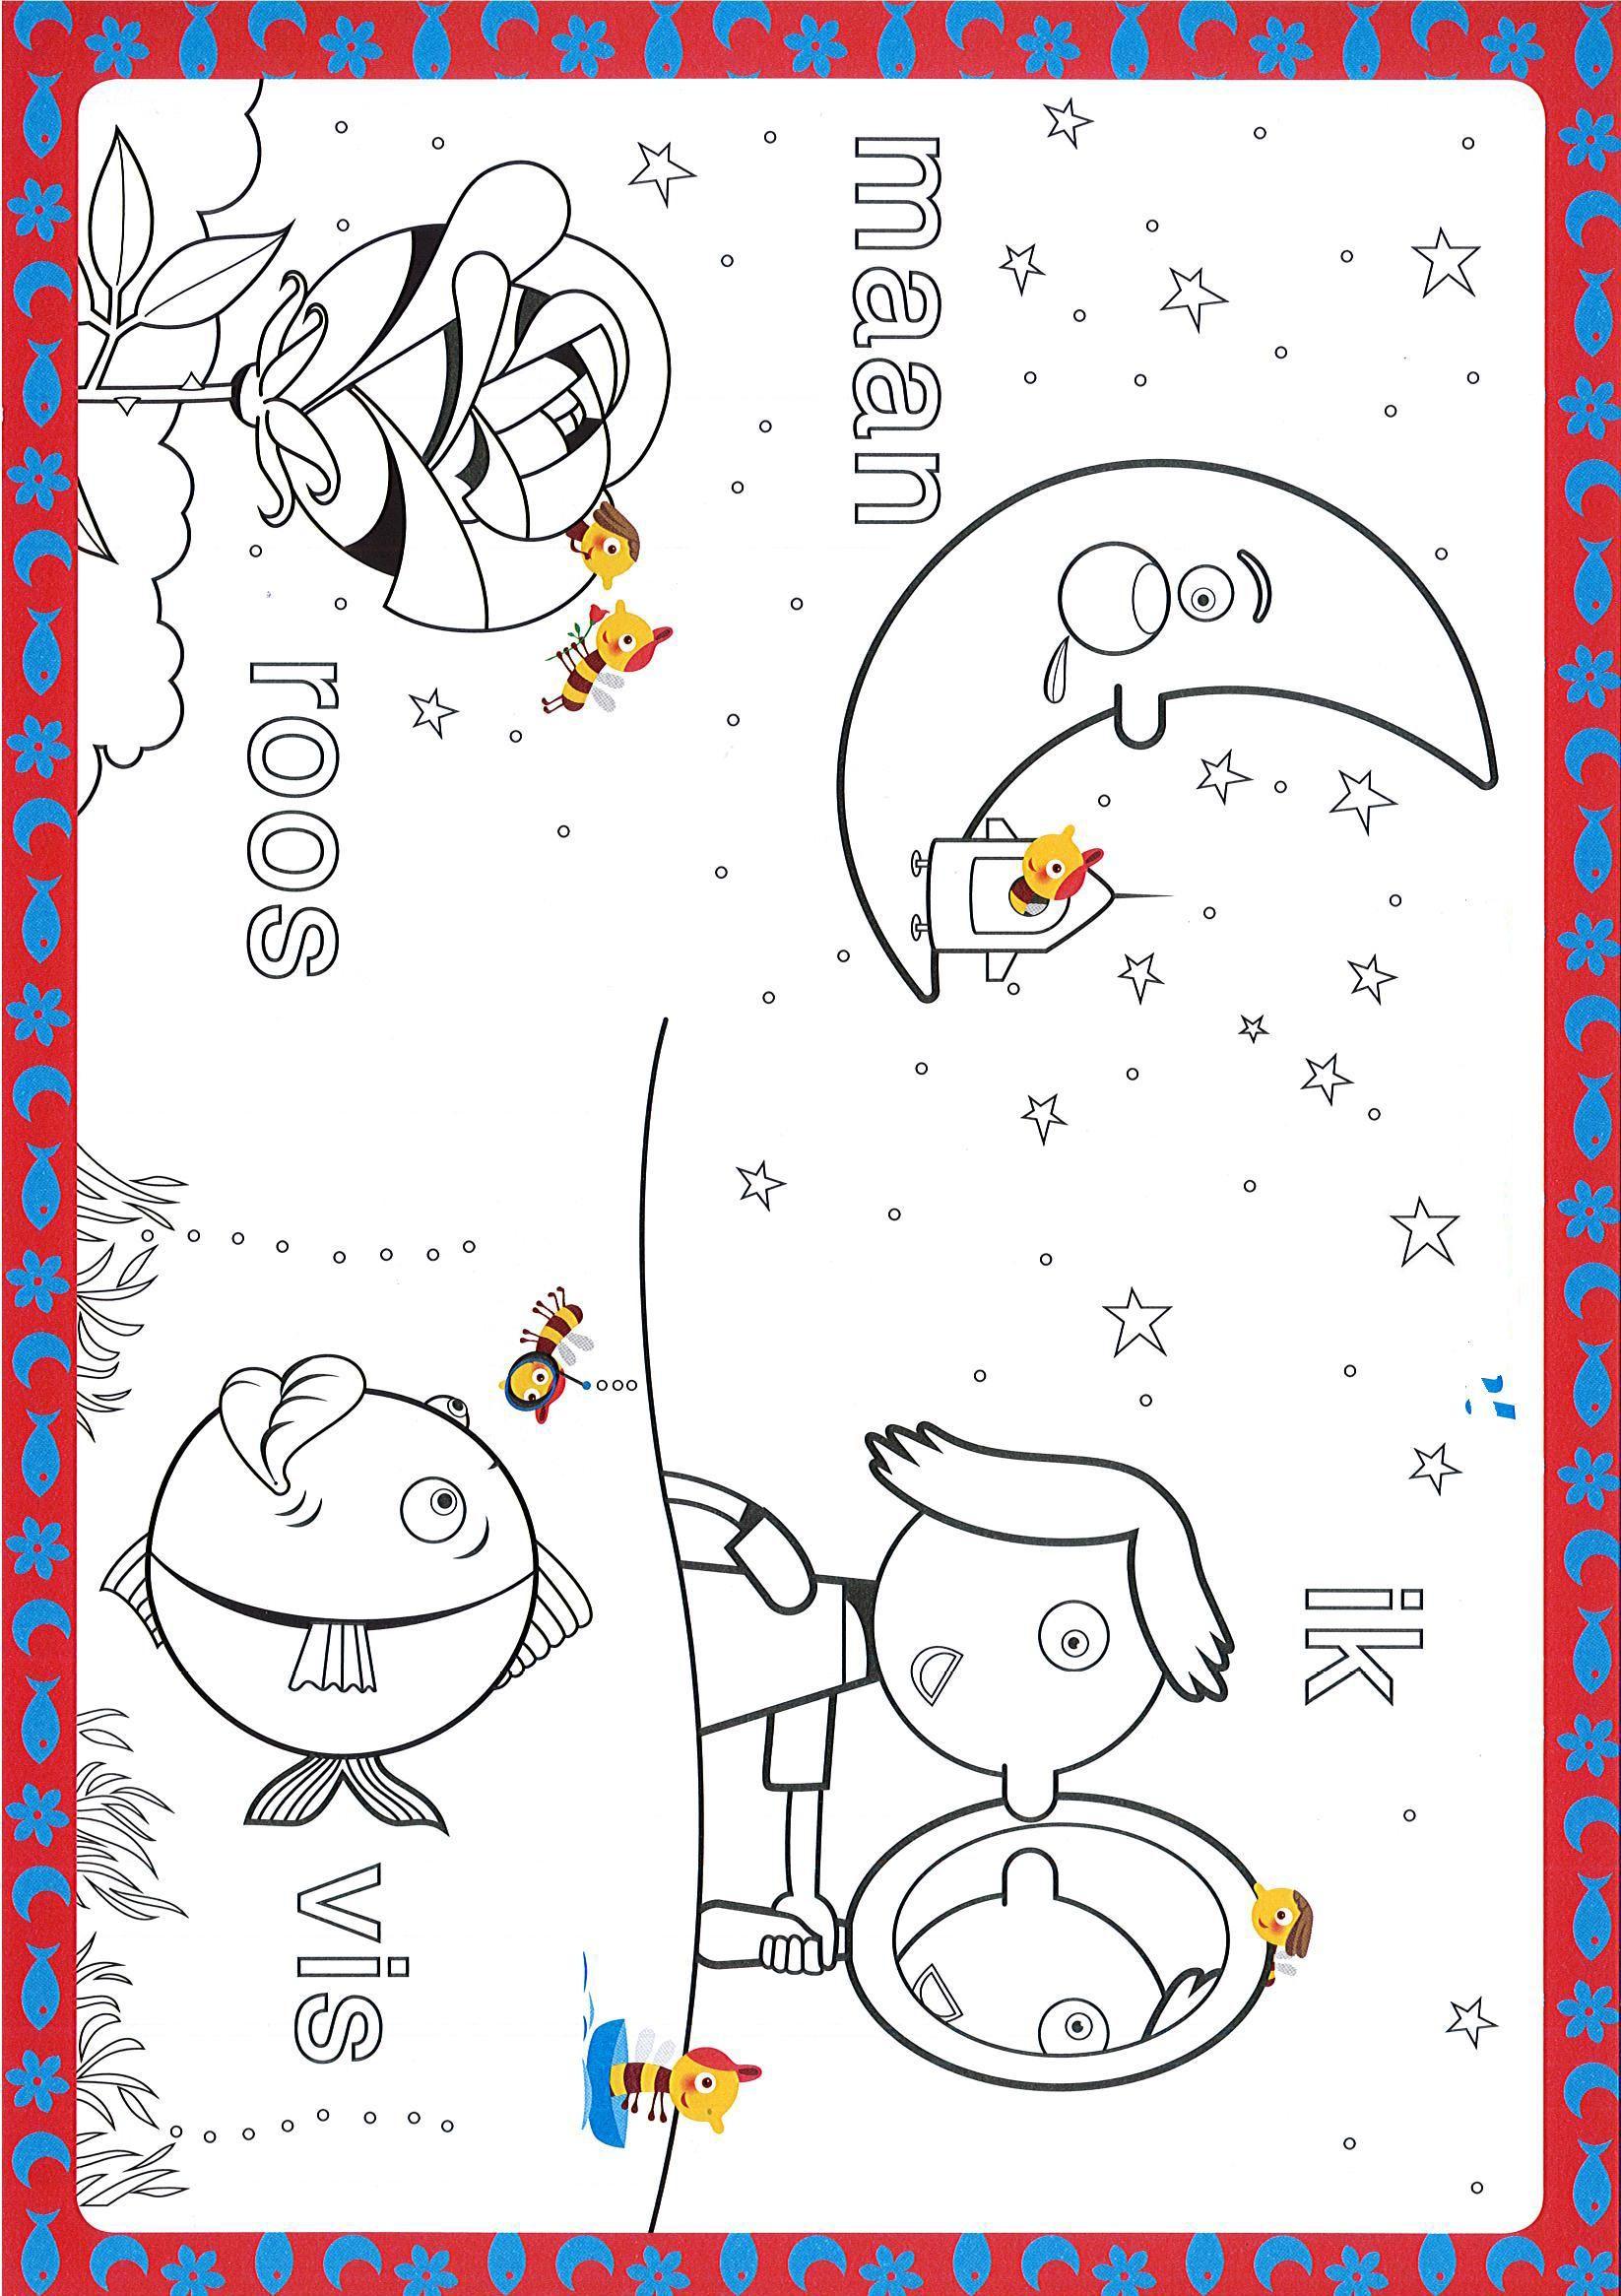 Kleurplaten Maan Roos Vis.Kern 1 Kleurplaat Ik Maan Roos Vis Ideeen Groep 3 Estudio